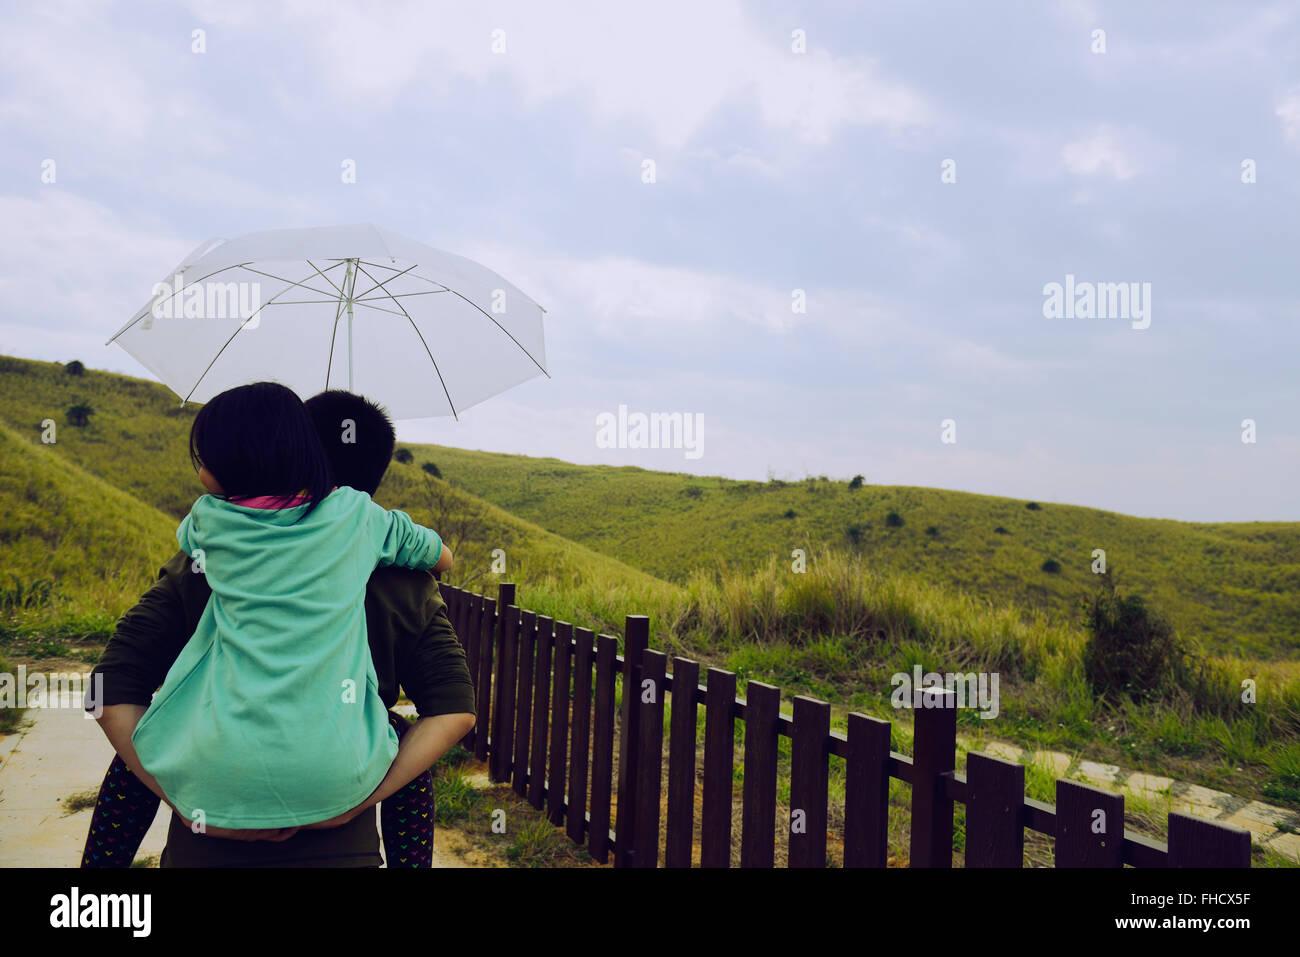 Tochter auf Vaters Rücken nehmen Regenschirm, Mädchen auf Vaters Rücken nehmen Regenschirm, Vater Stockbild